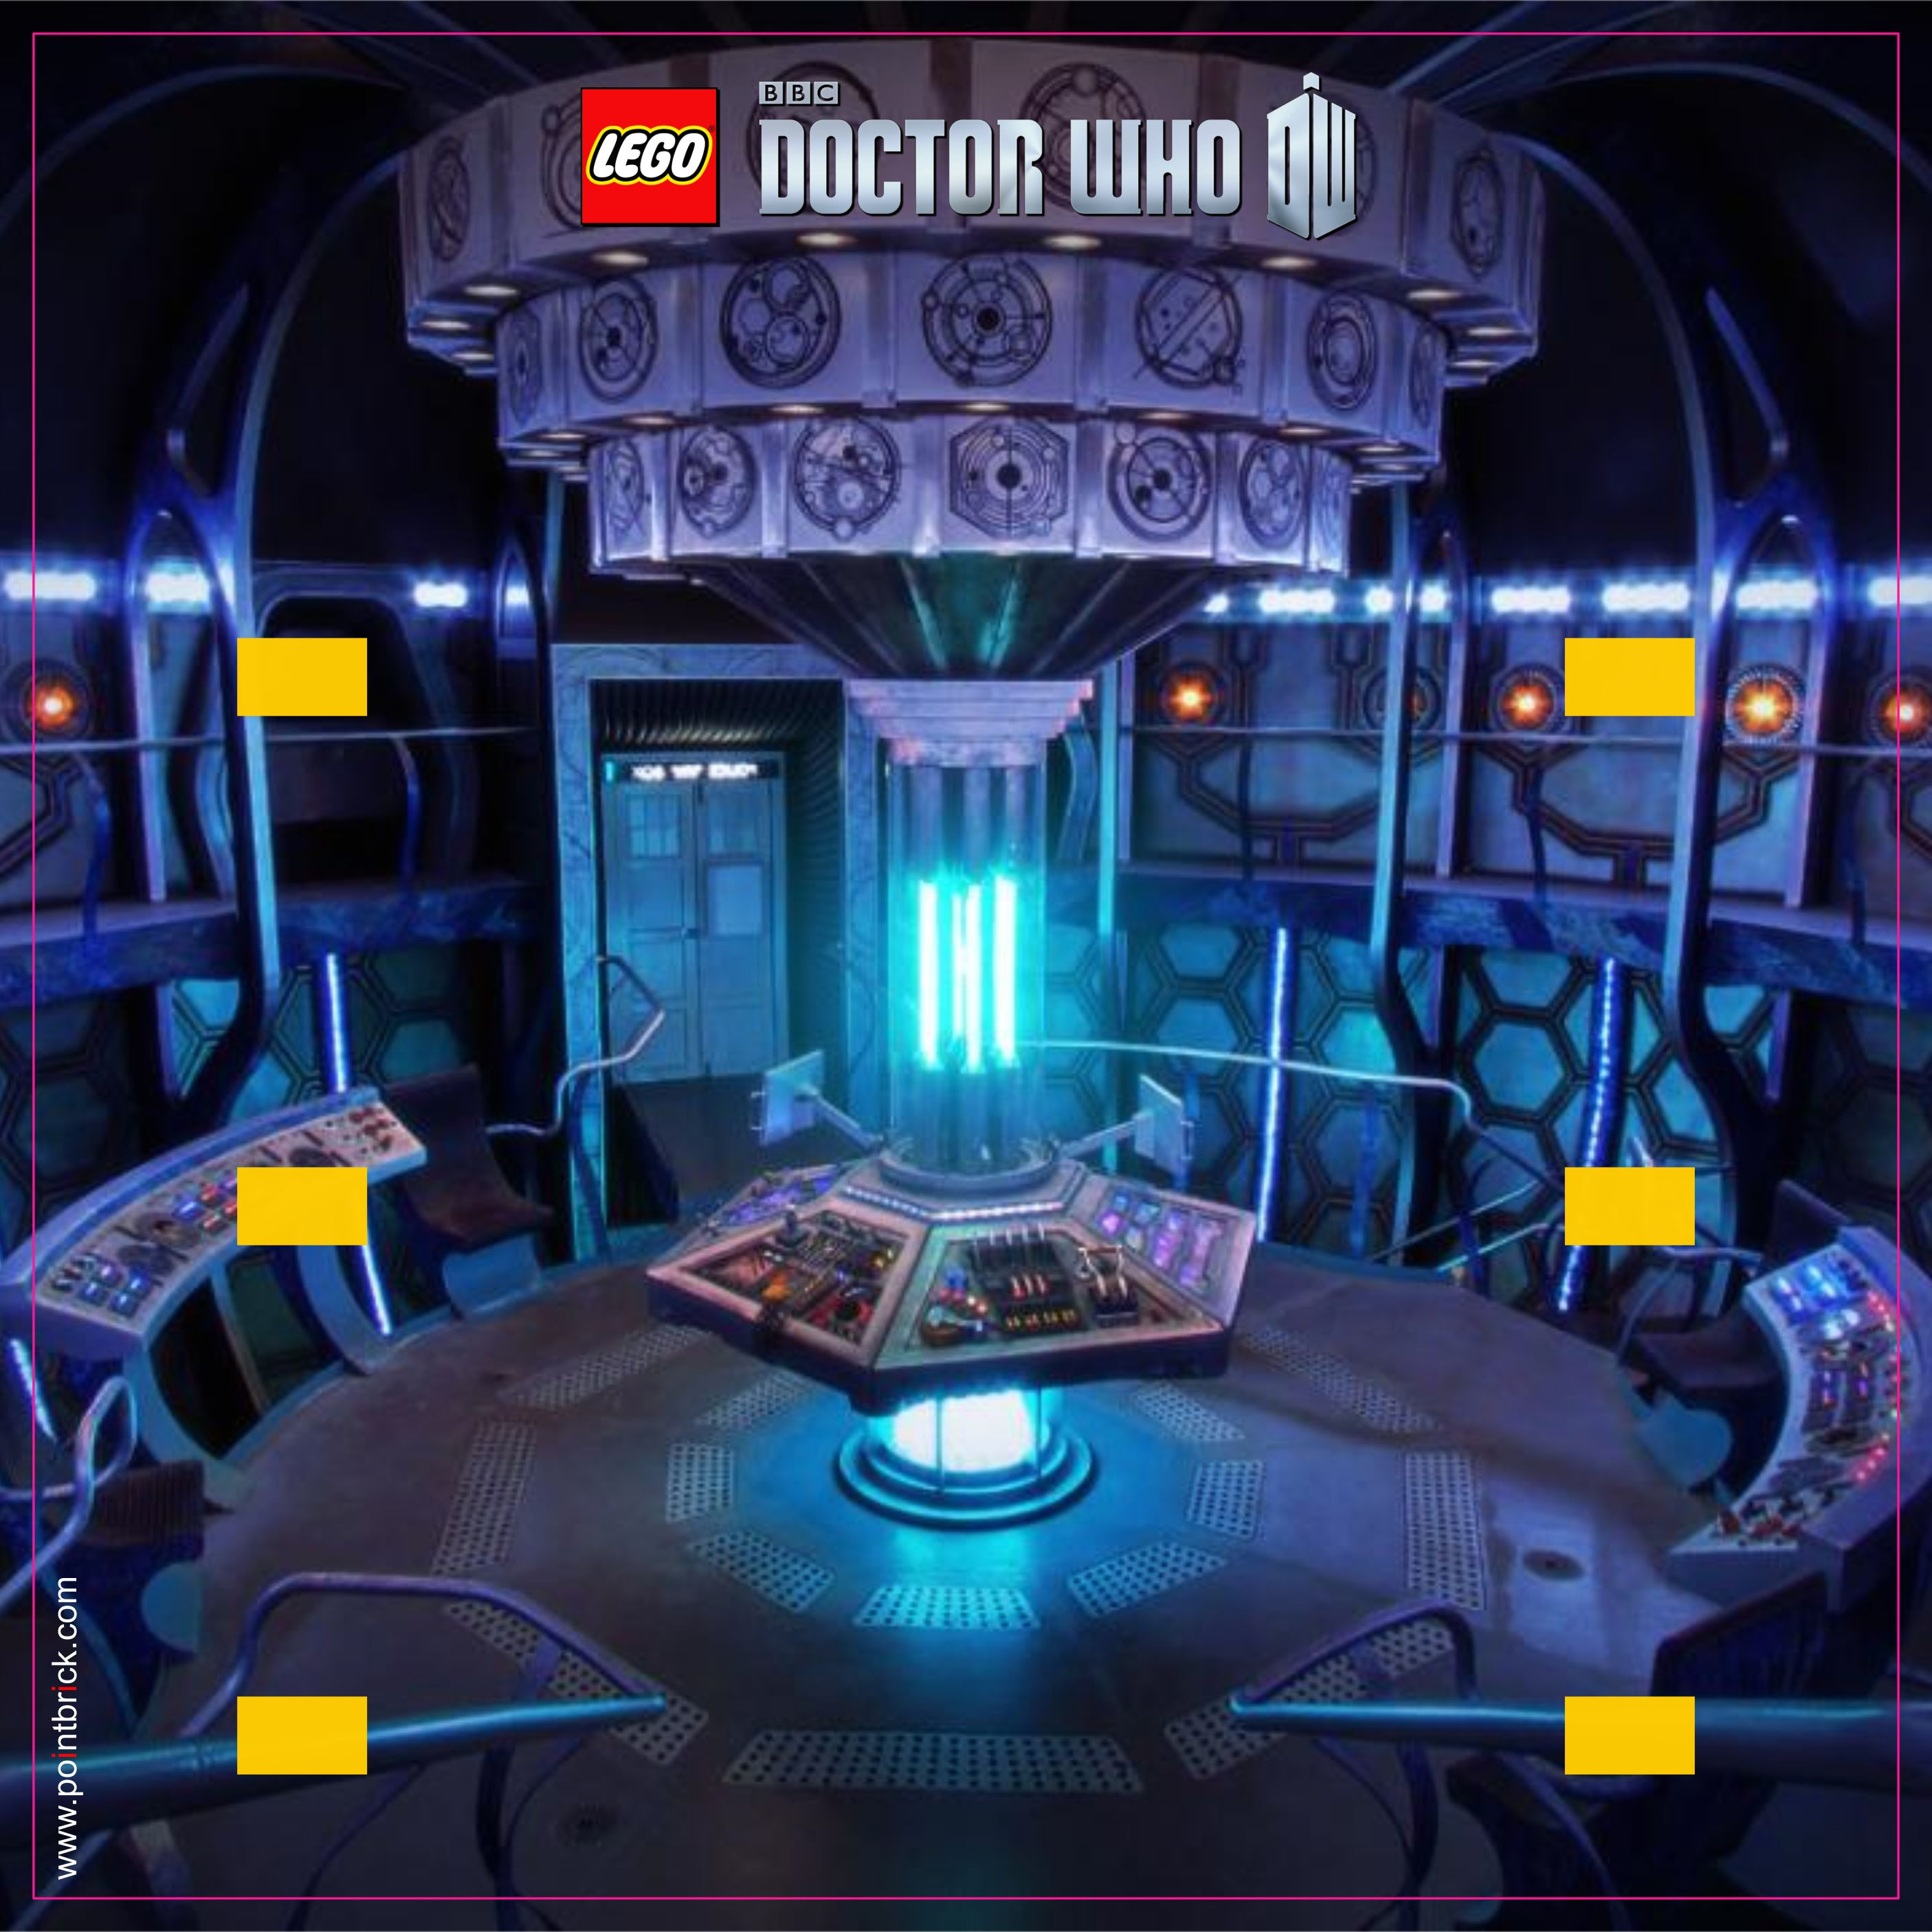 LEGO Minifigures Display Frame - Background 230mm Doctor Who - TARDIS INSIDE - Clicca sull'immagine per scaricarla gratuitamente!